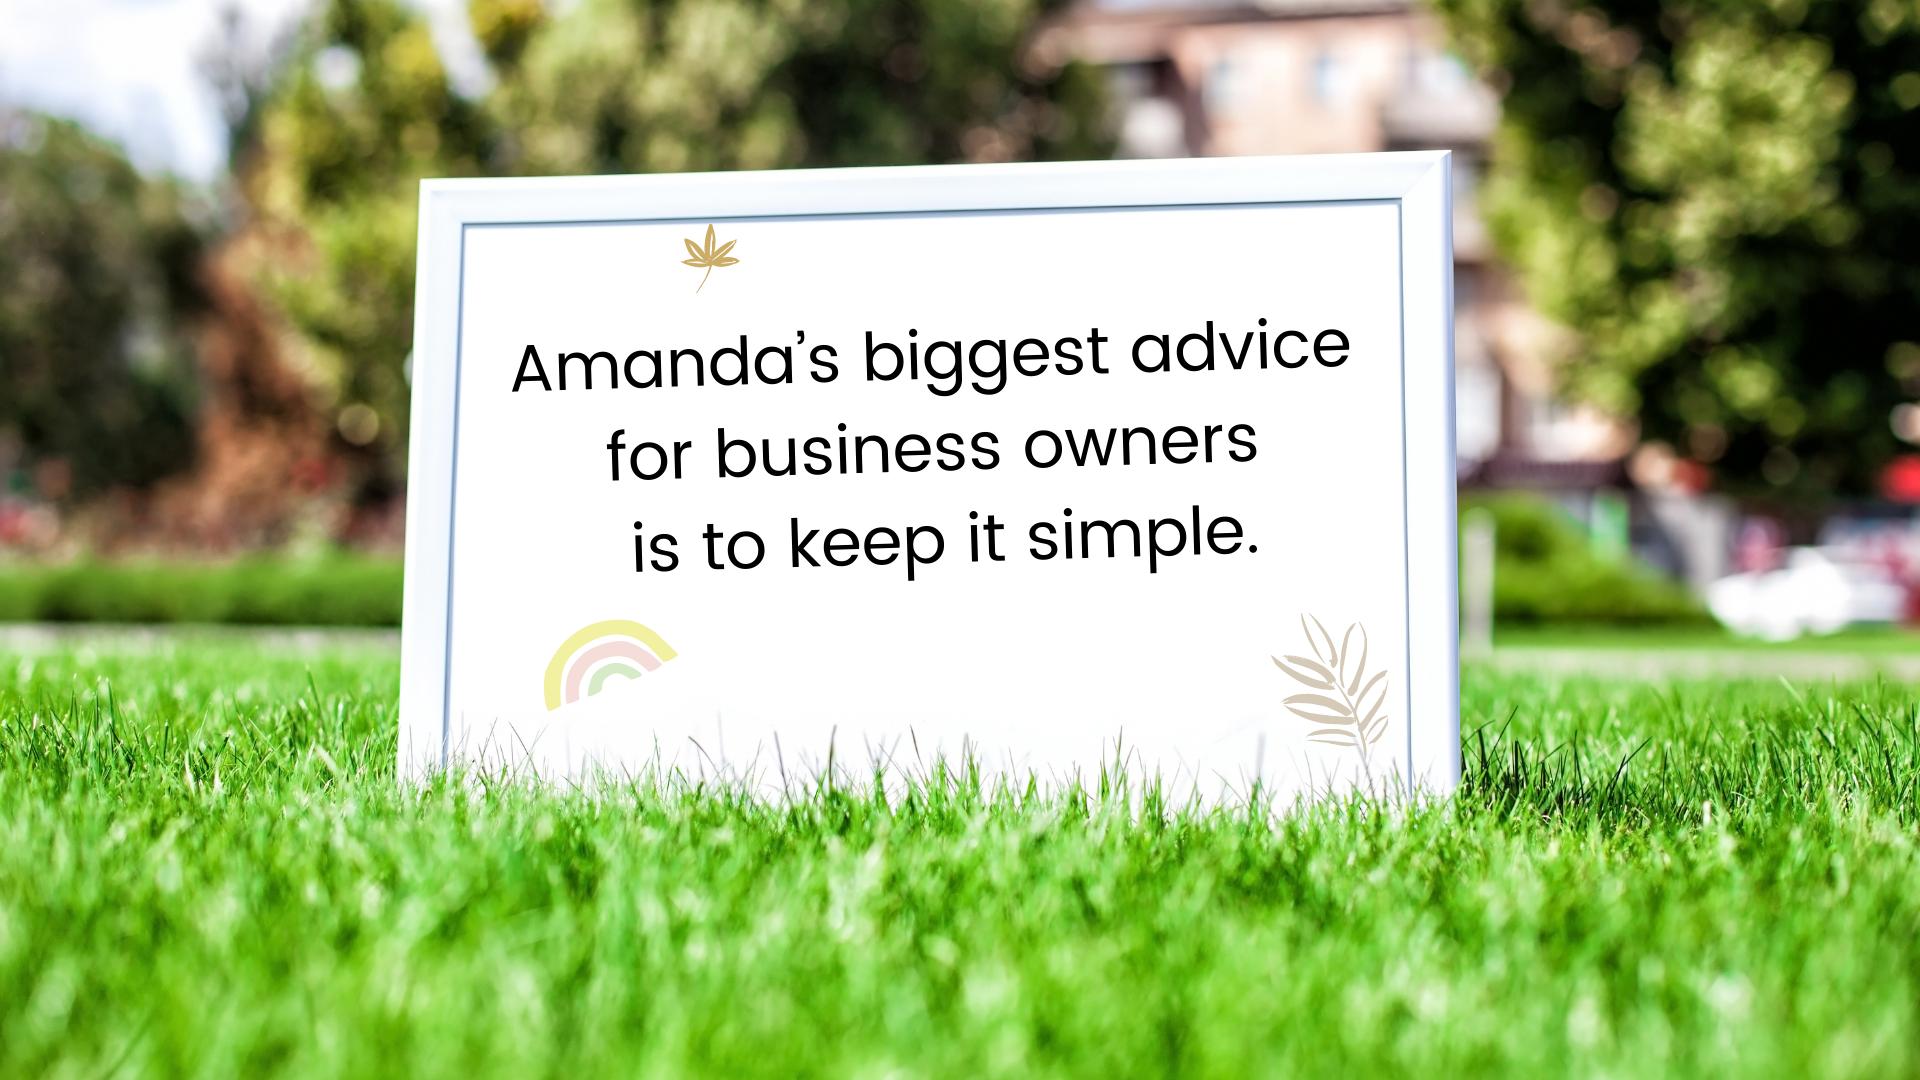 Amandas biggest advice